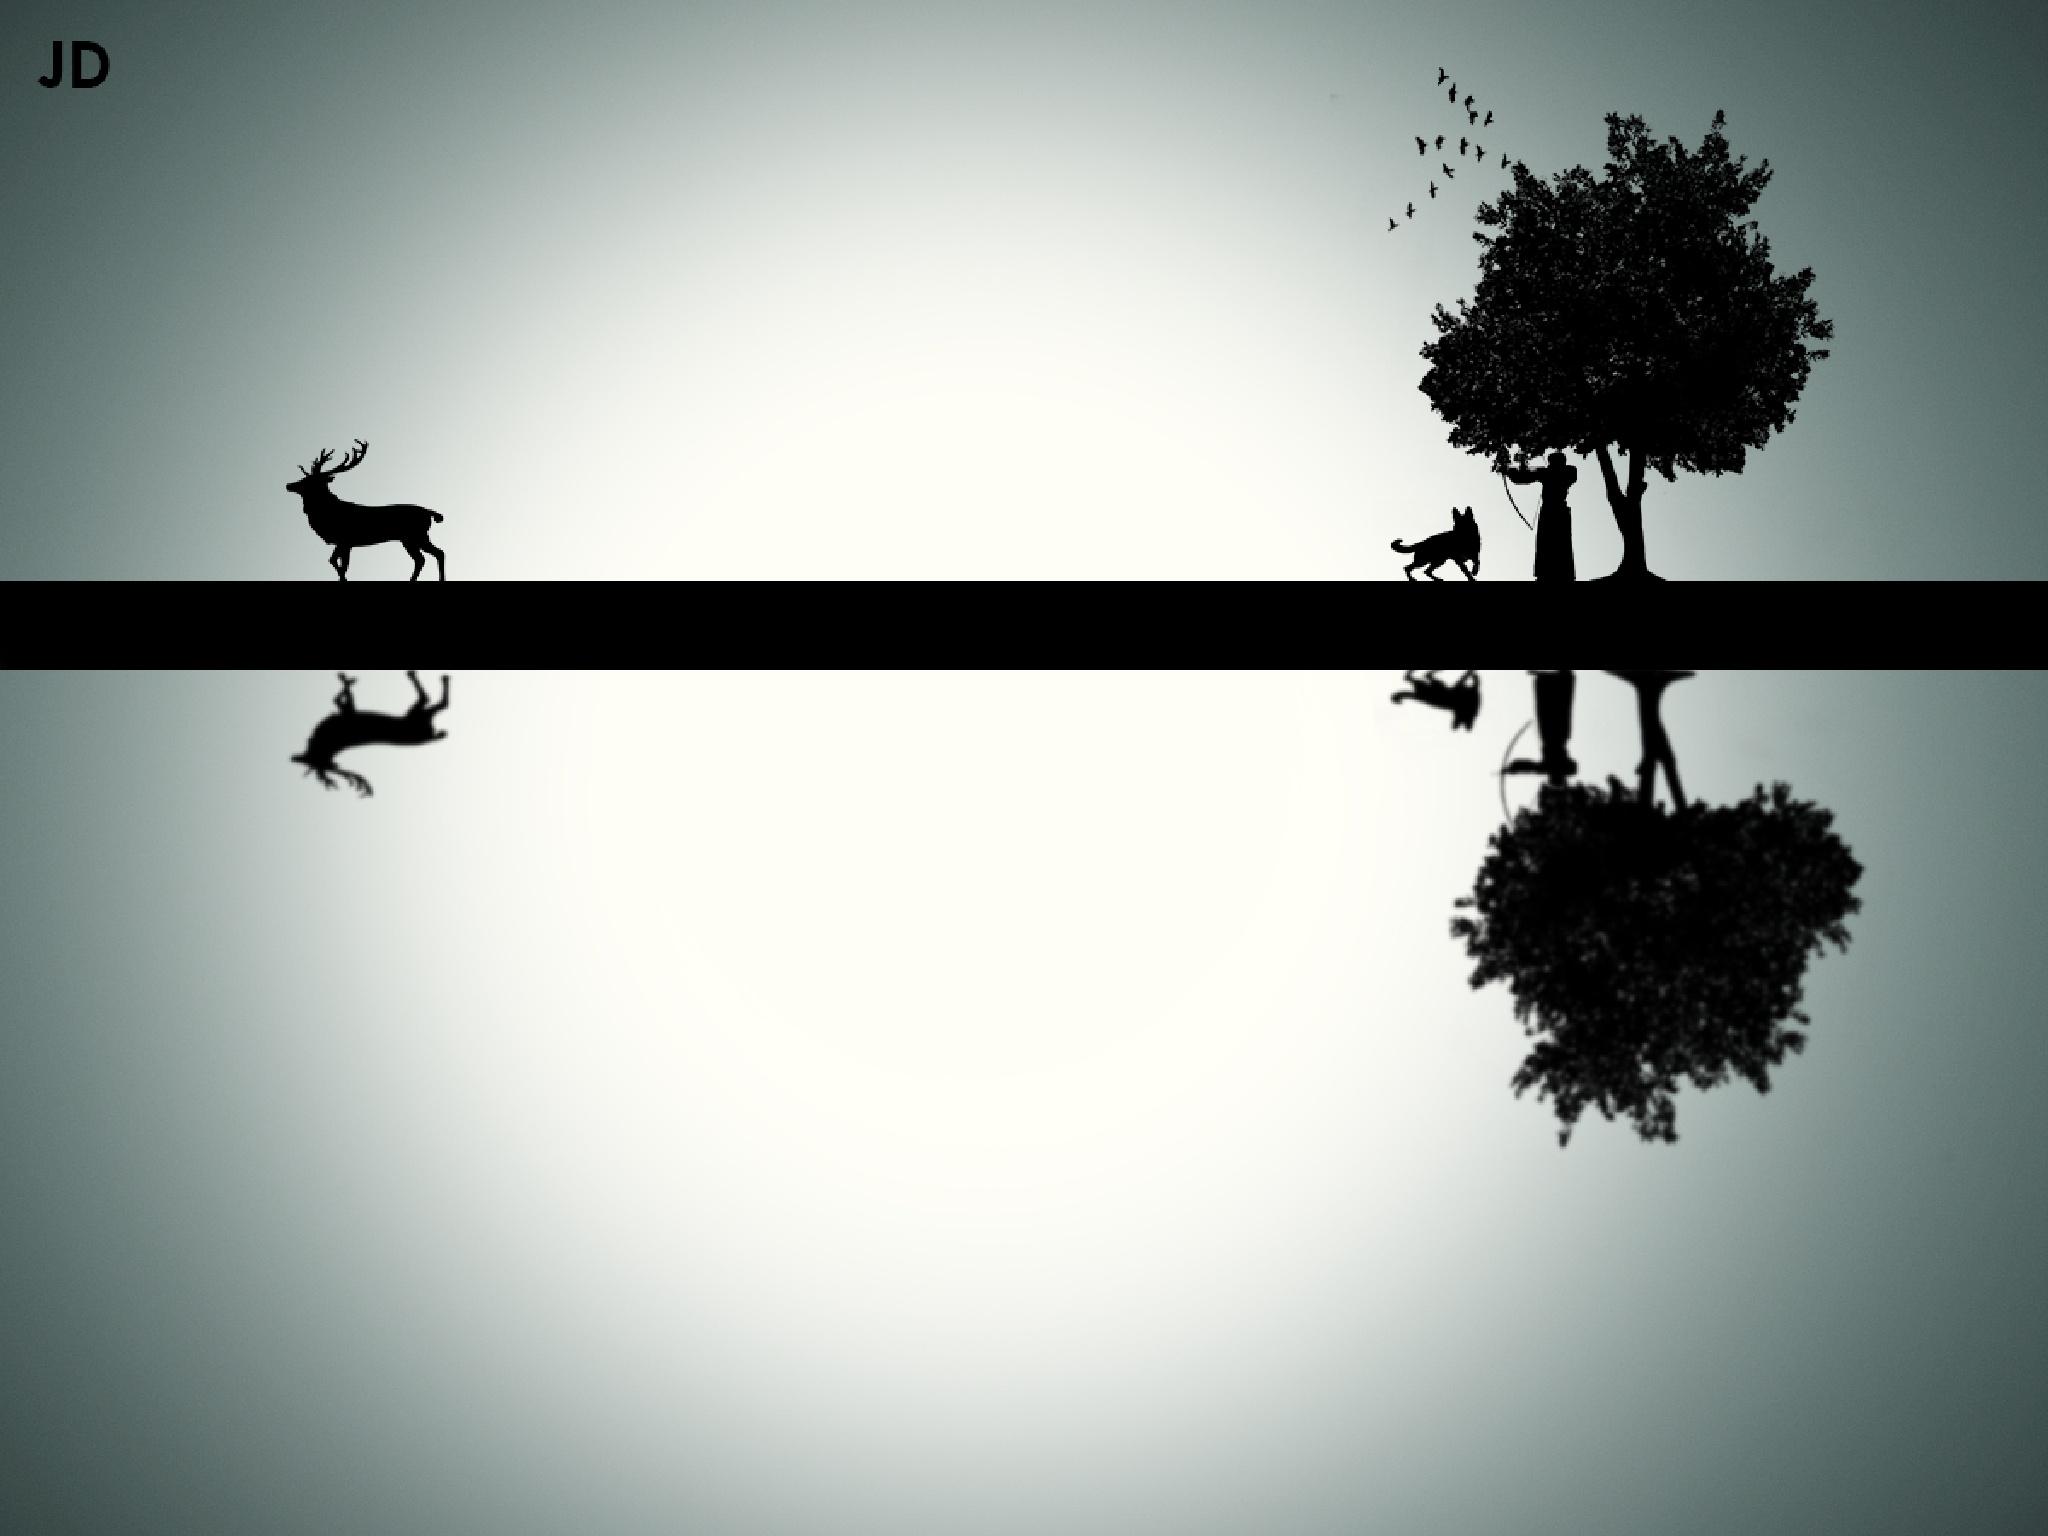 hunter  by JawadJD